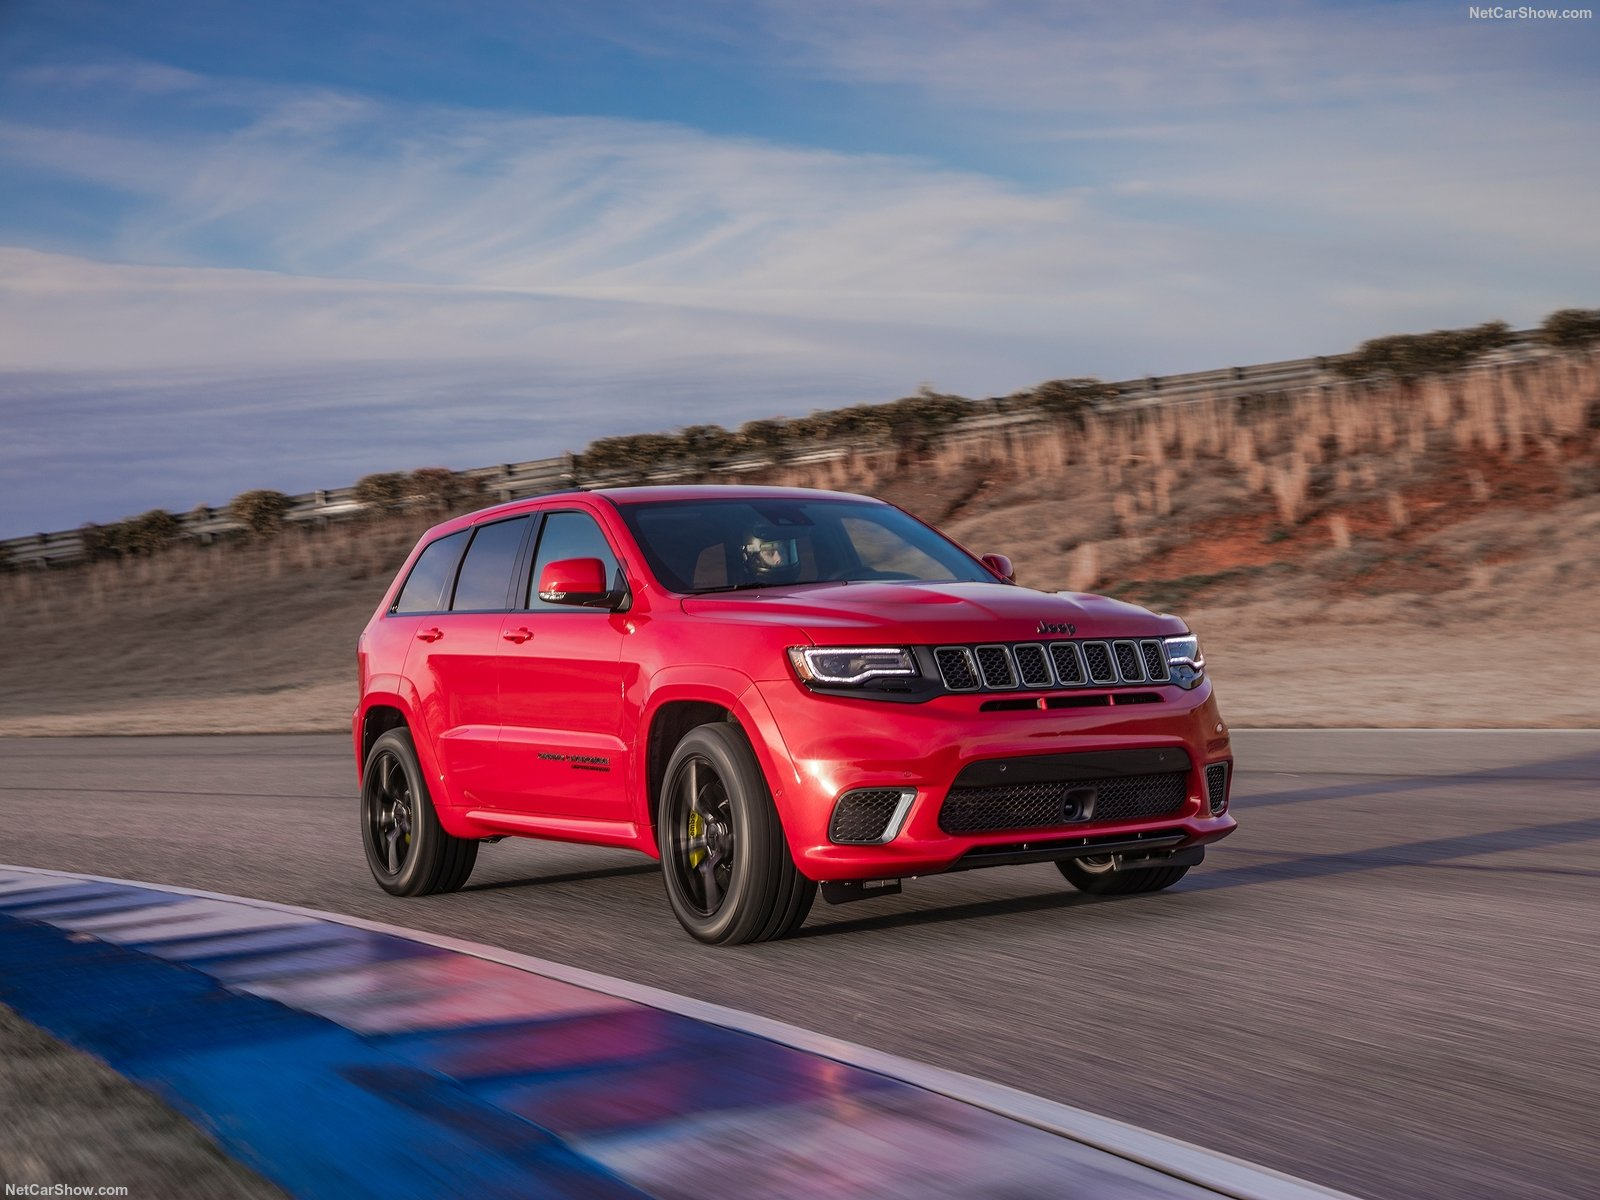 Jeep-Grand_Cherokee_Trackhawk-2018-1600-04